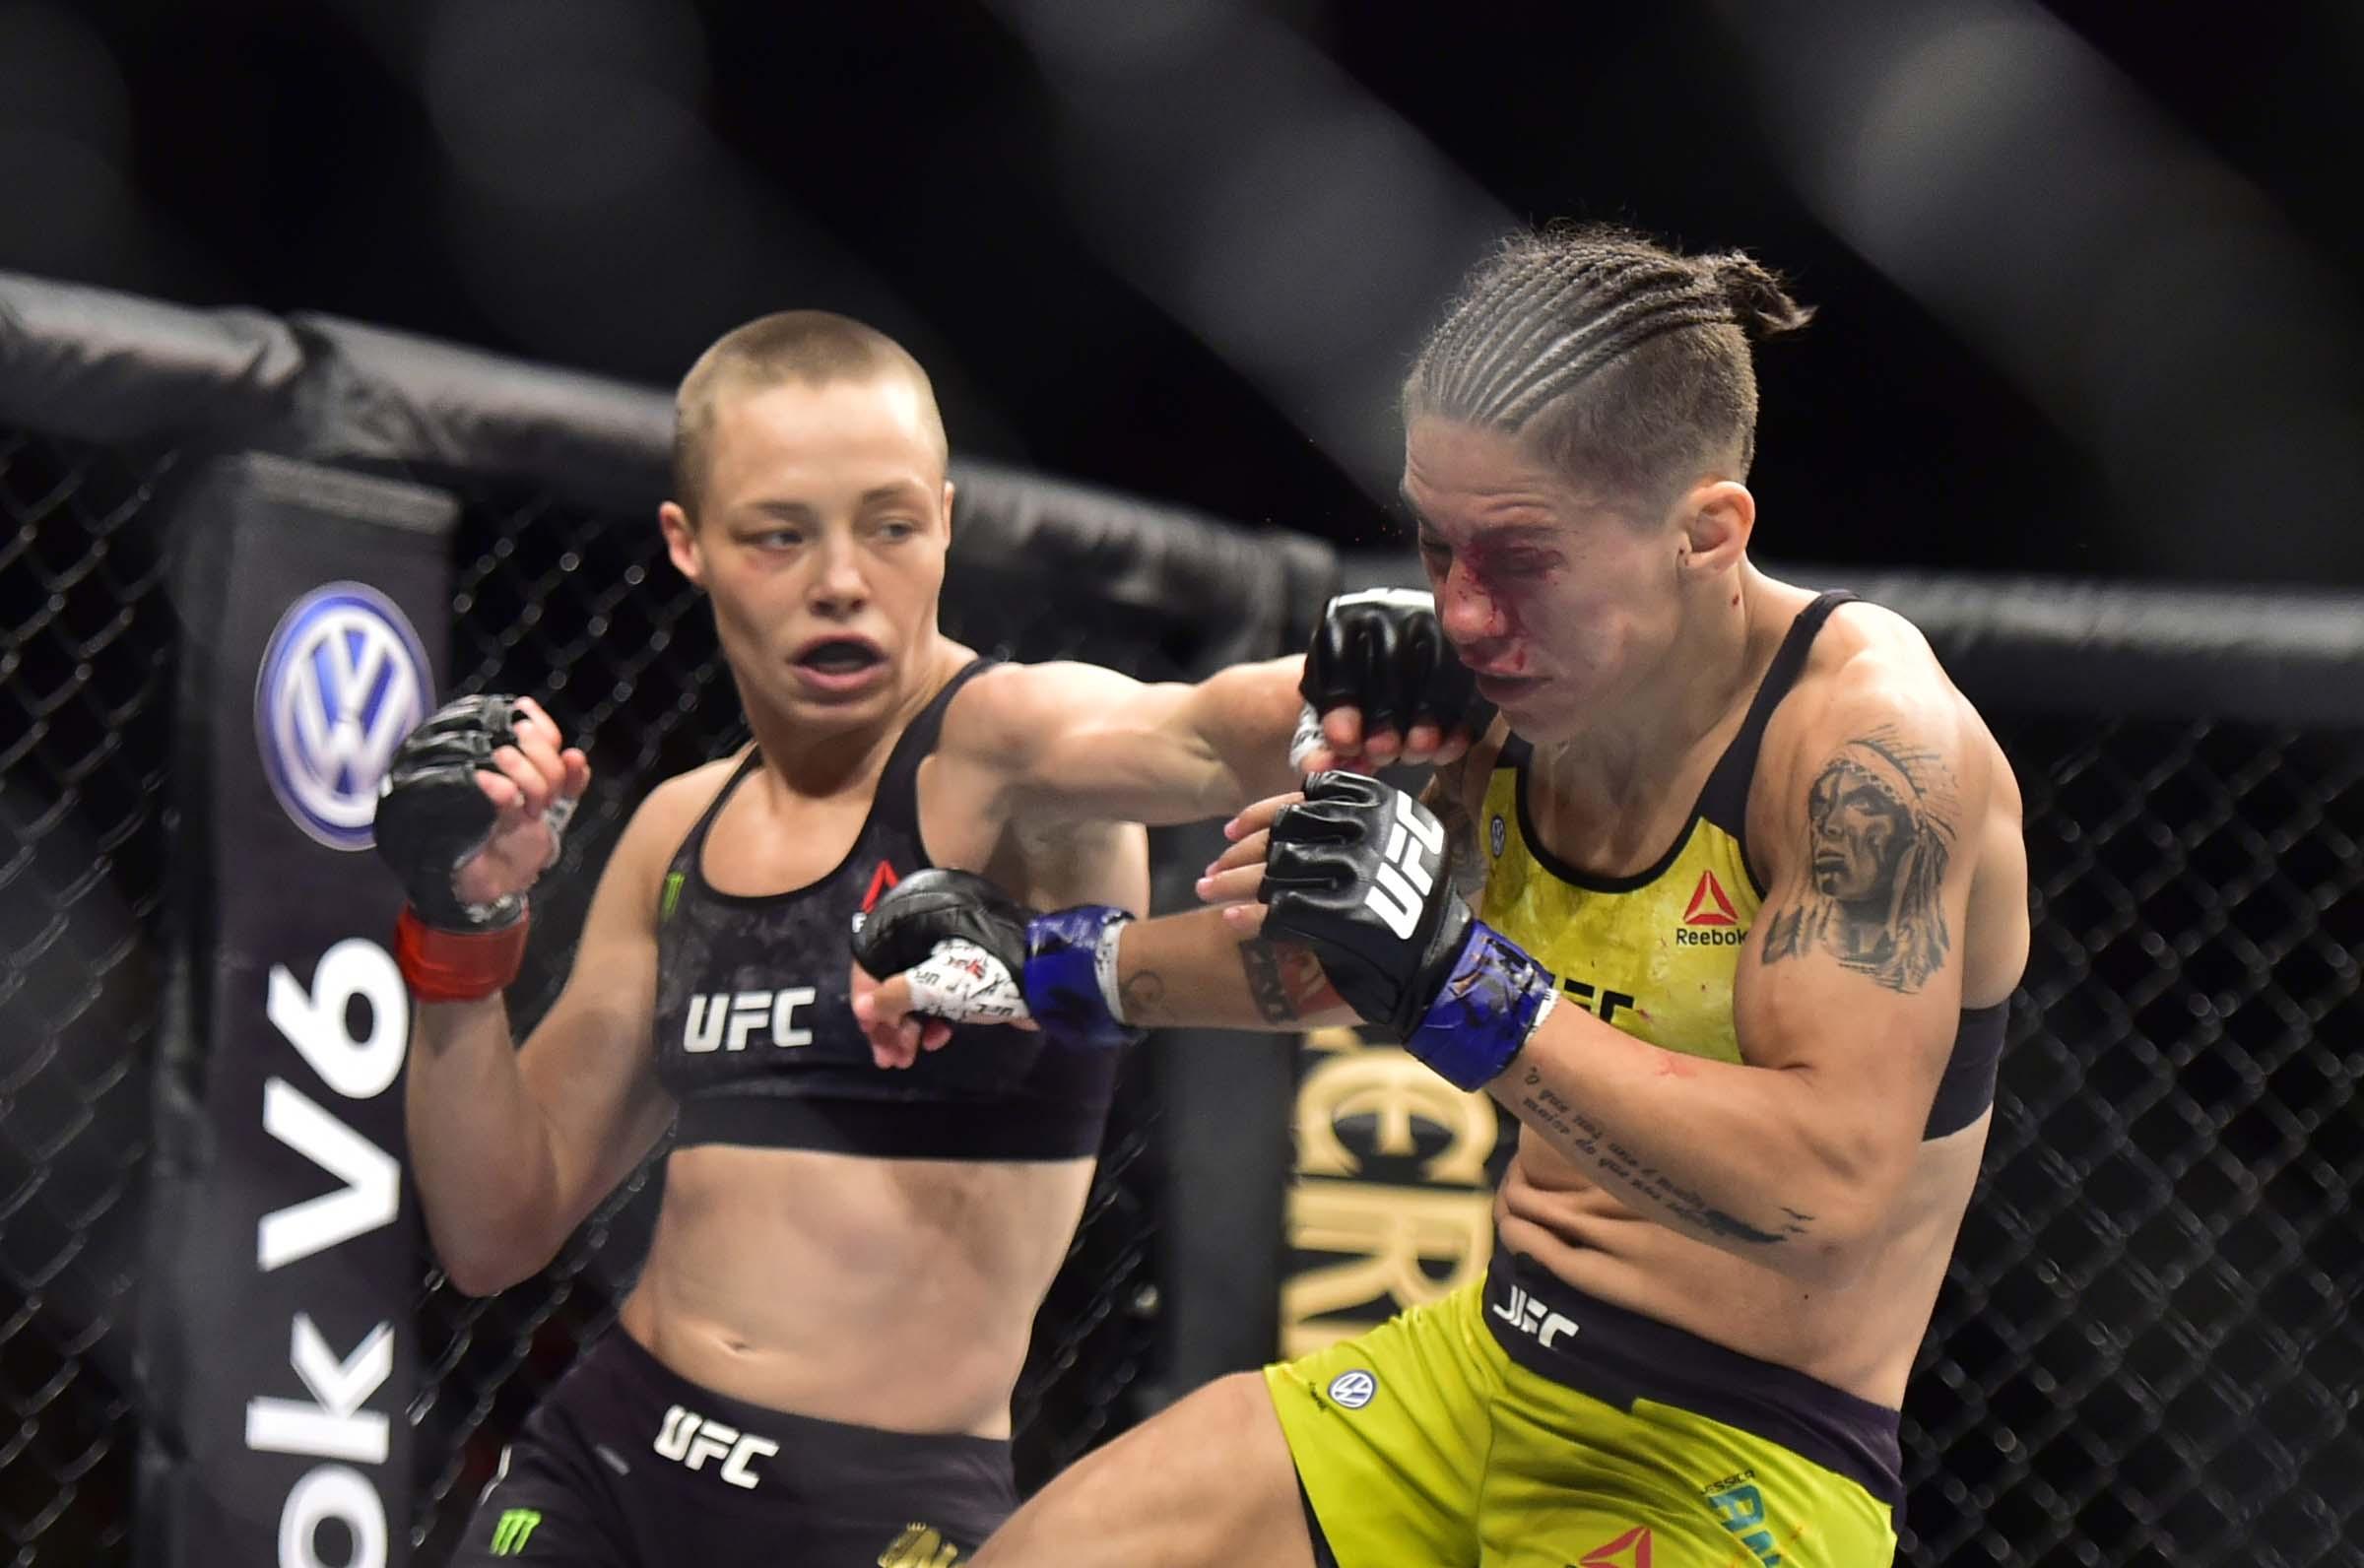 video review : Rose Namajunas versus Jessica Andrade at UFC 237